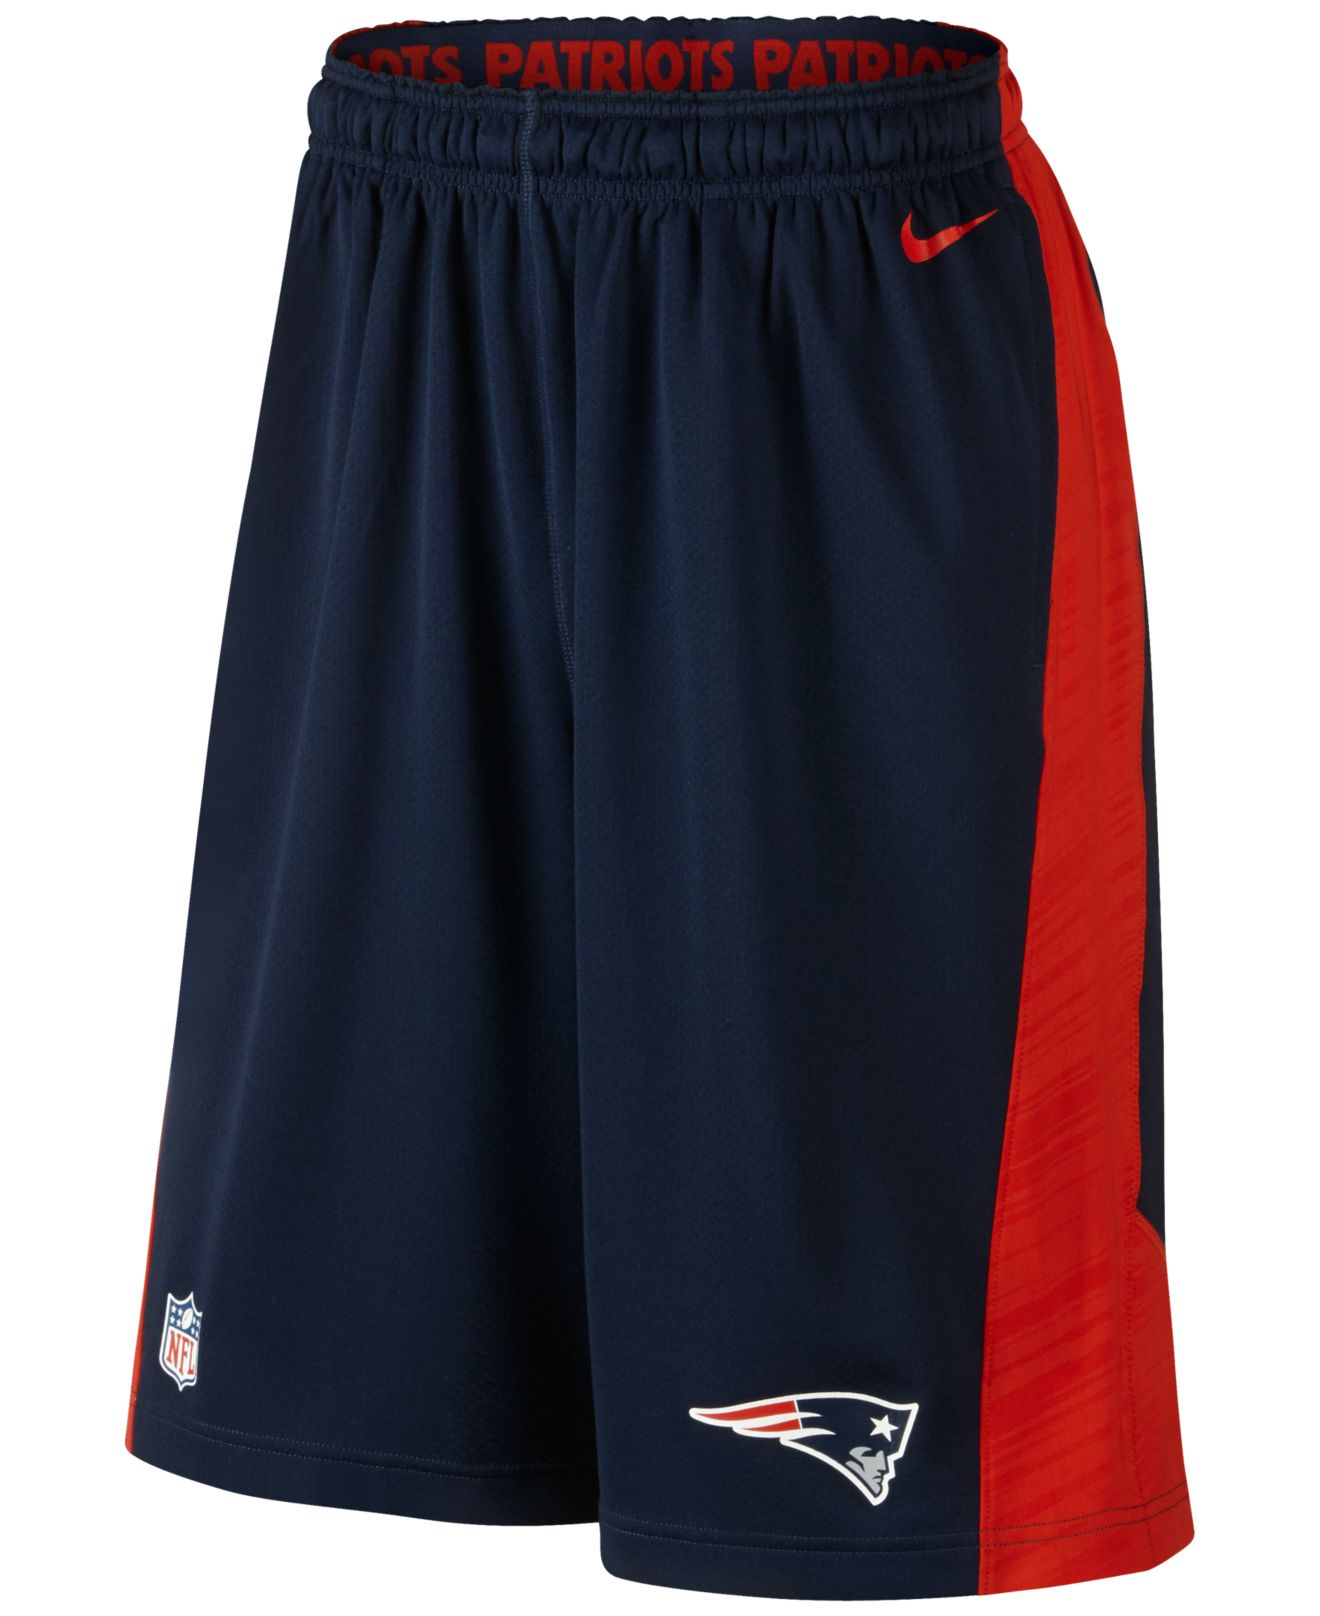 Lyst - Nike Men S New England Patriots Fly Xl Dri-Fit Shorts in Blue ... 0771dfe07